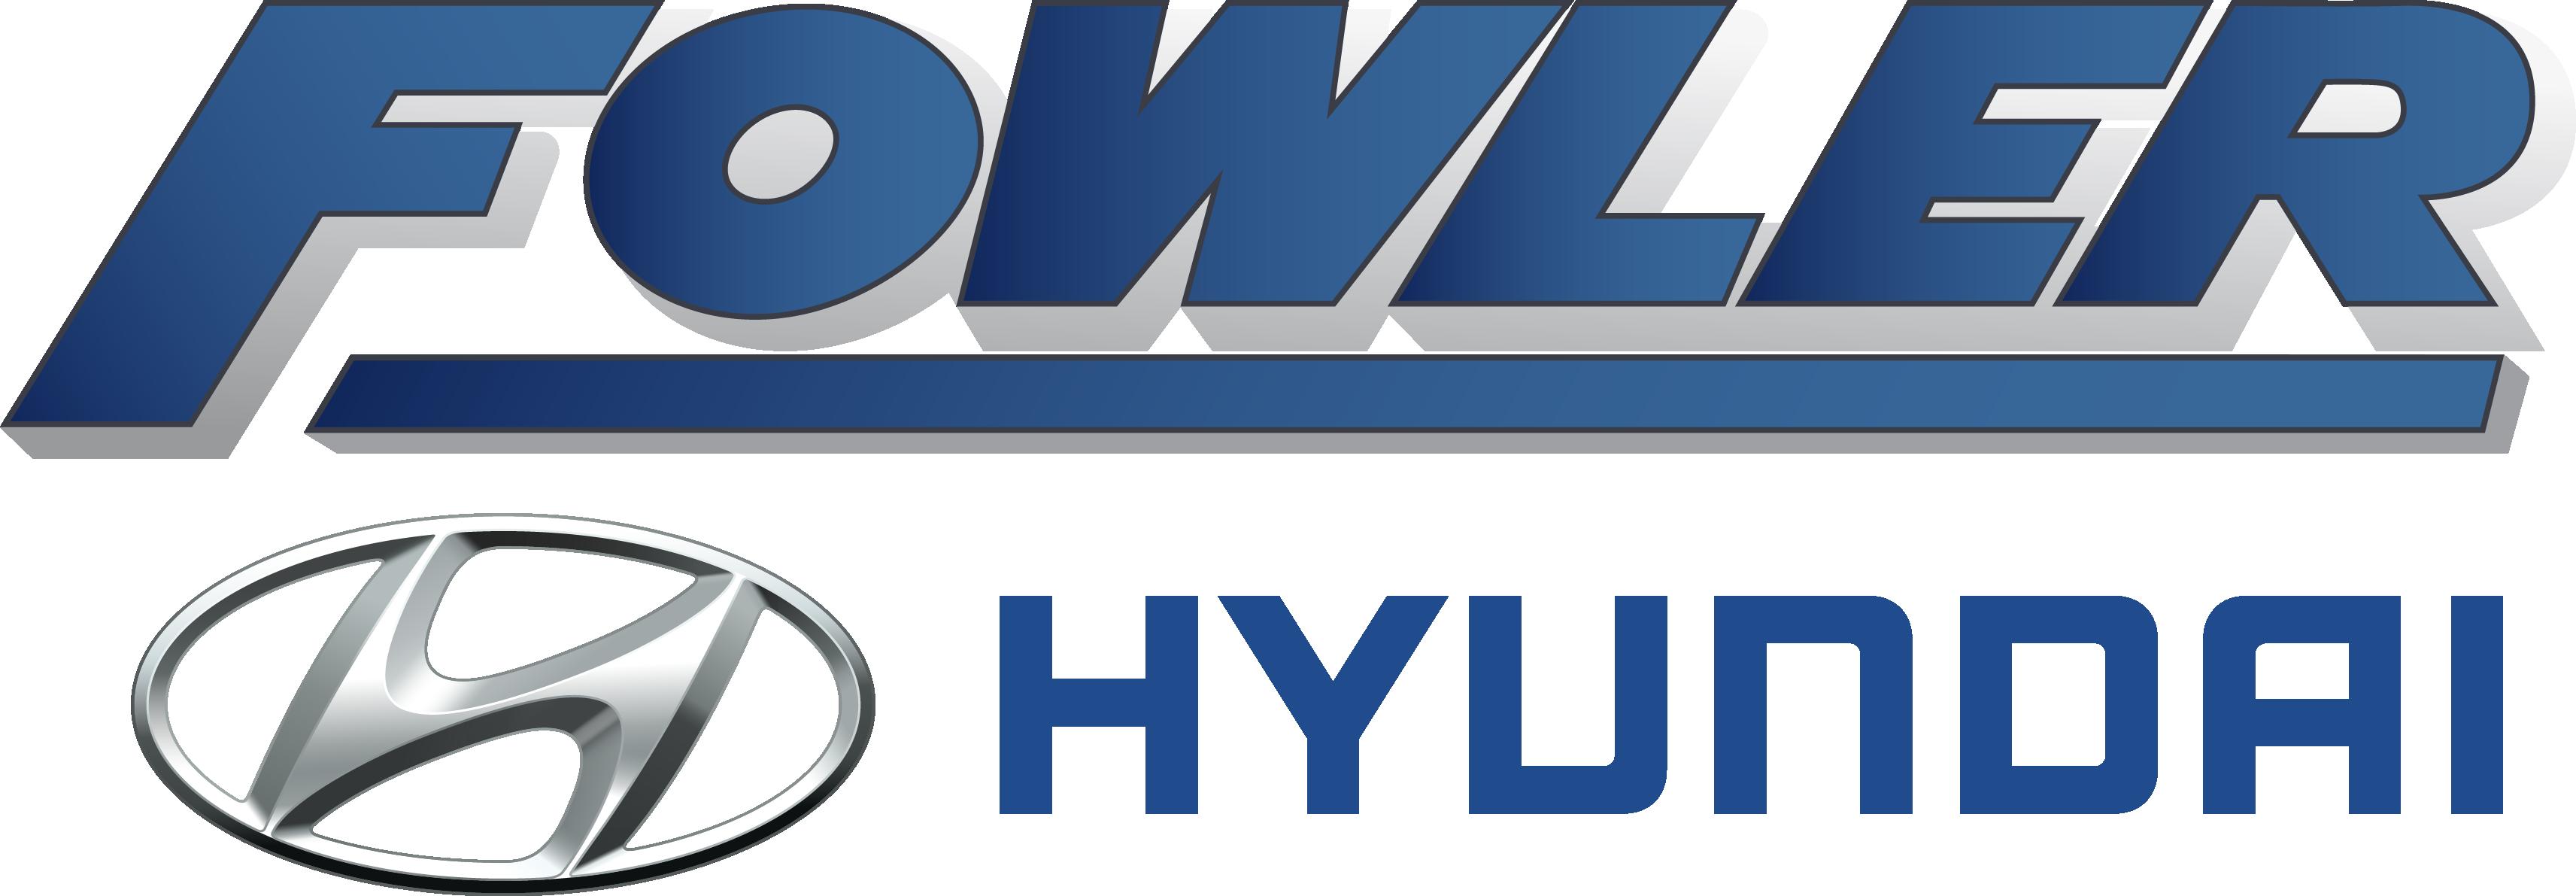 Fowler Hyundai Logo